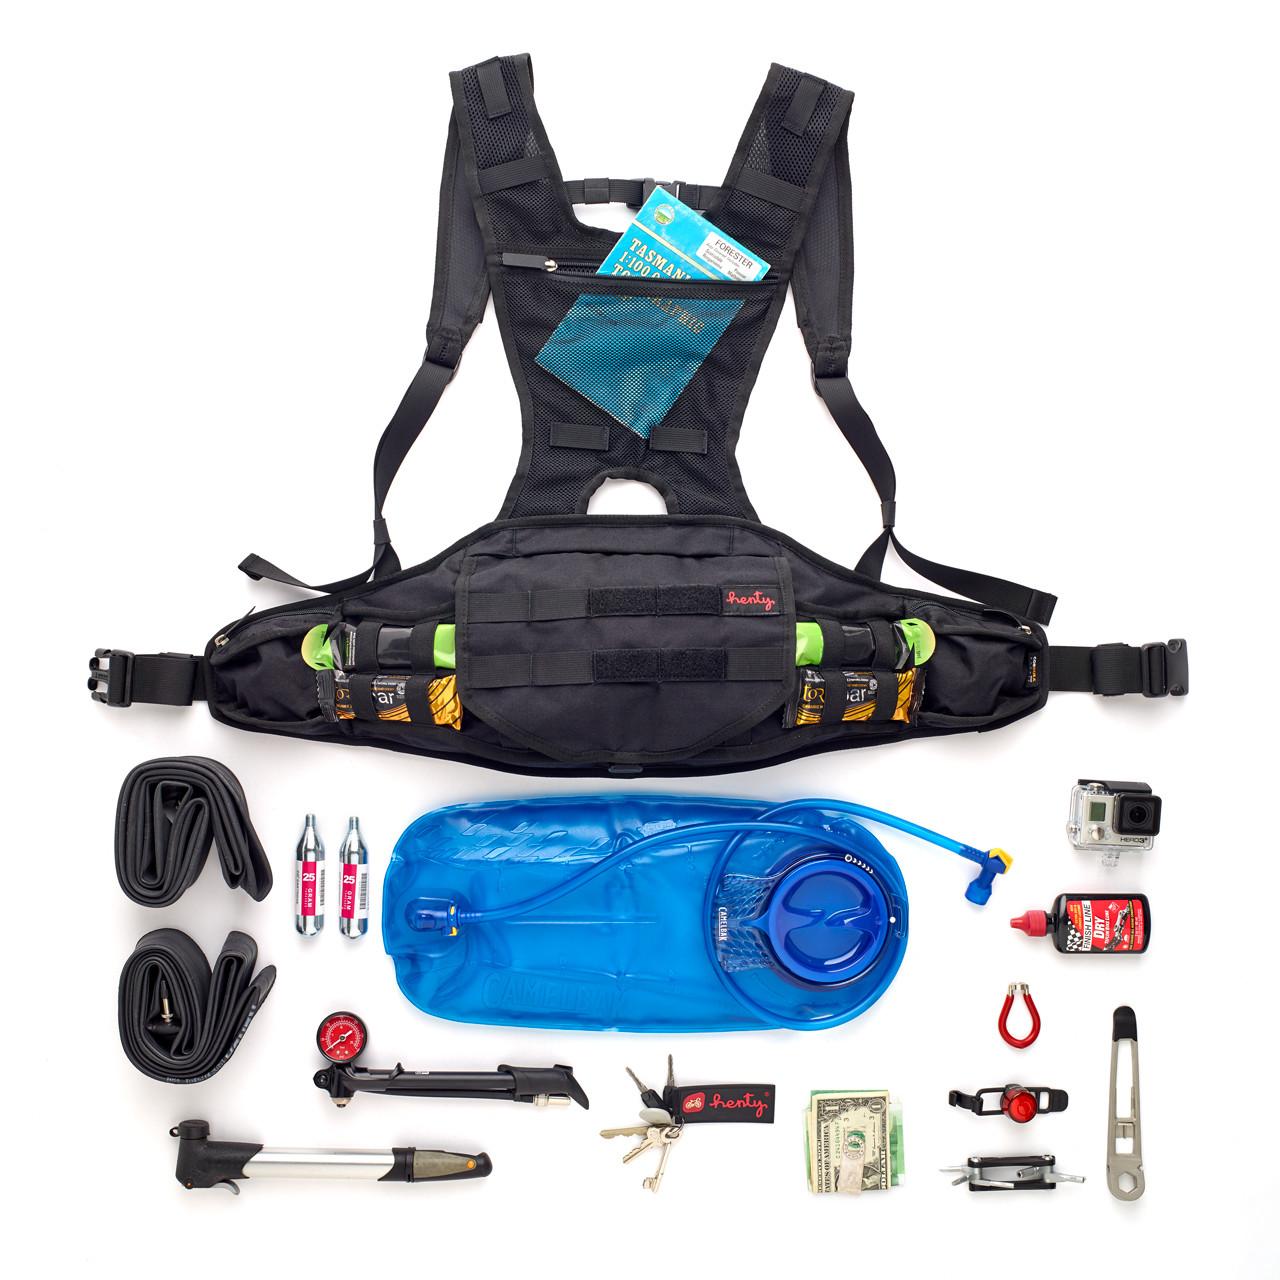 Tasmania S Henty Introduces Enduro Backpack Takes